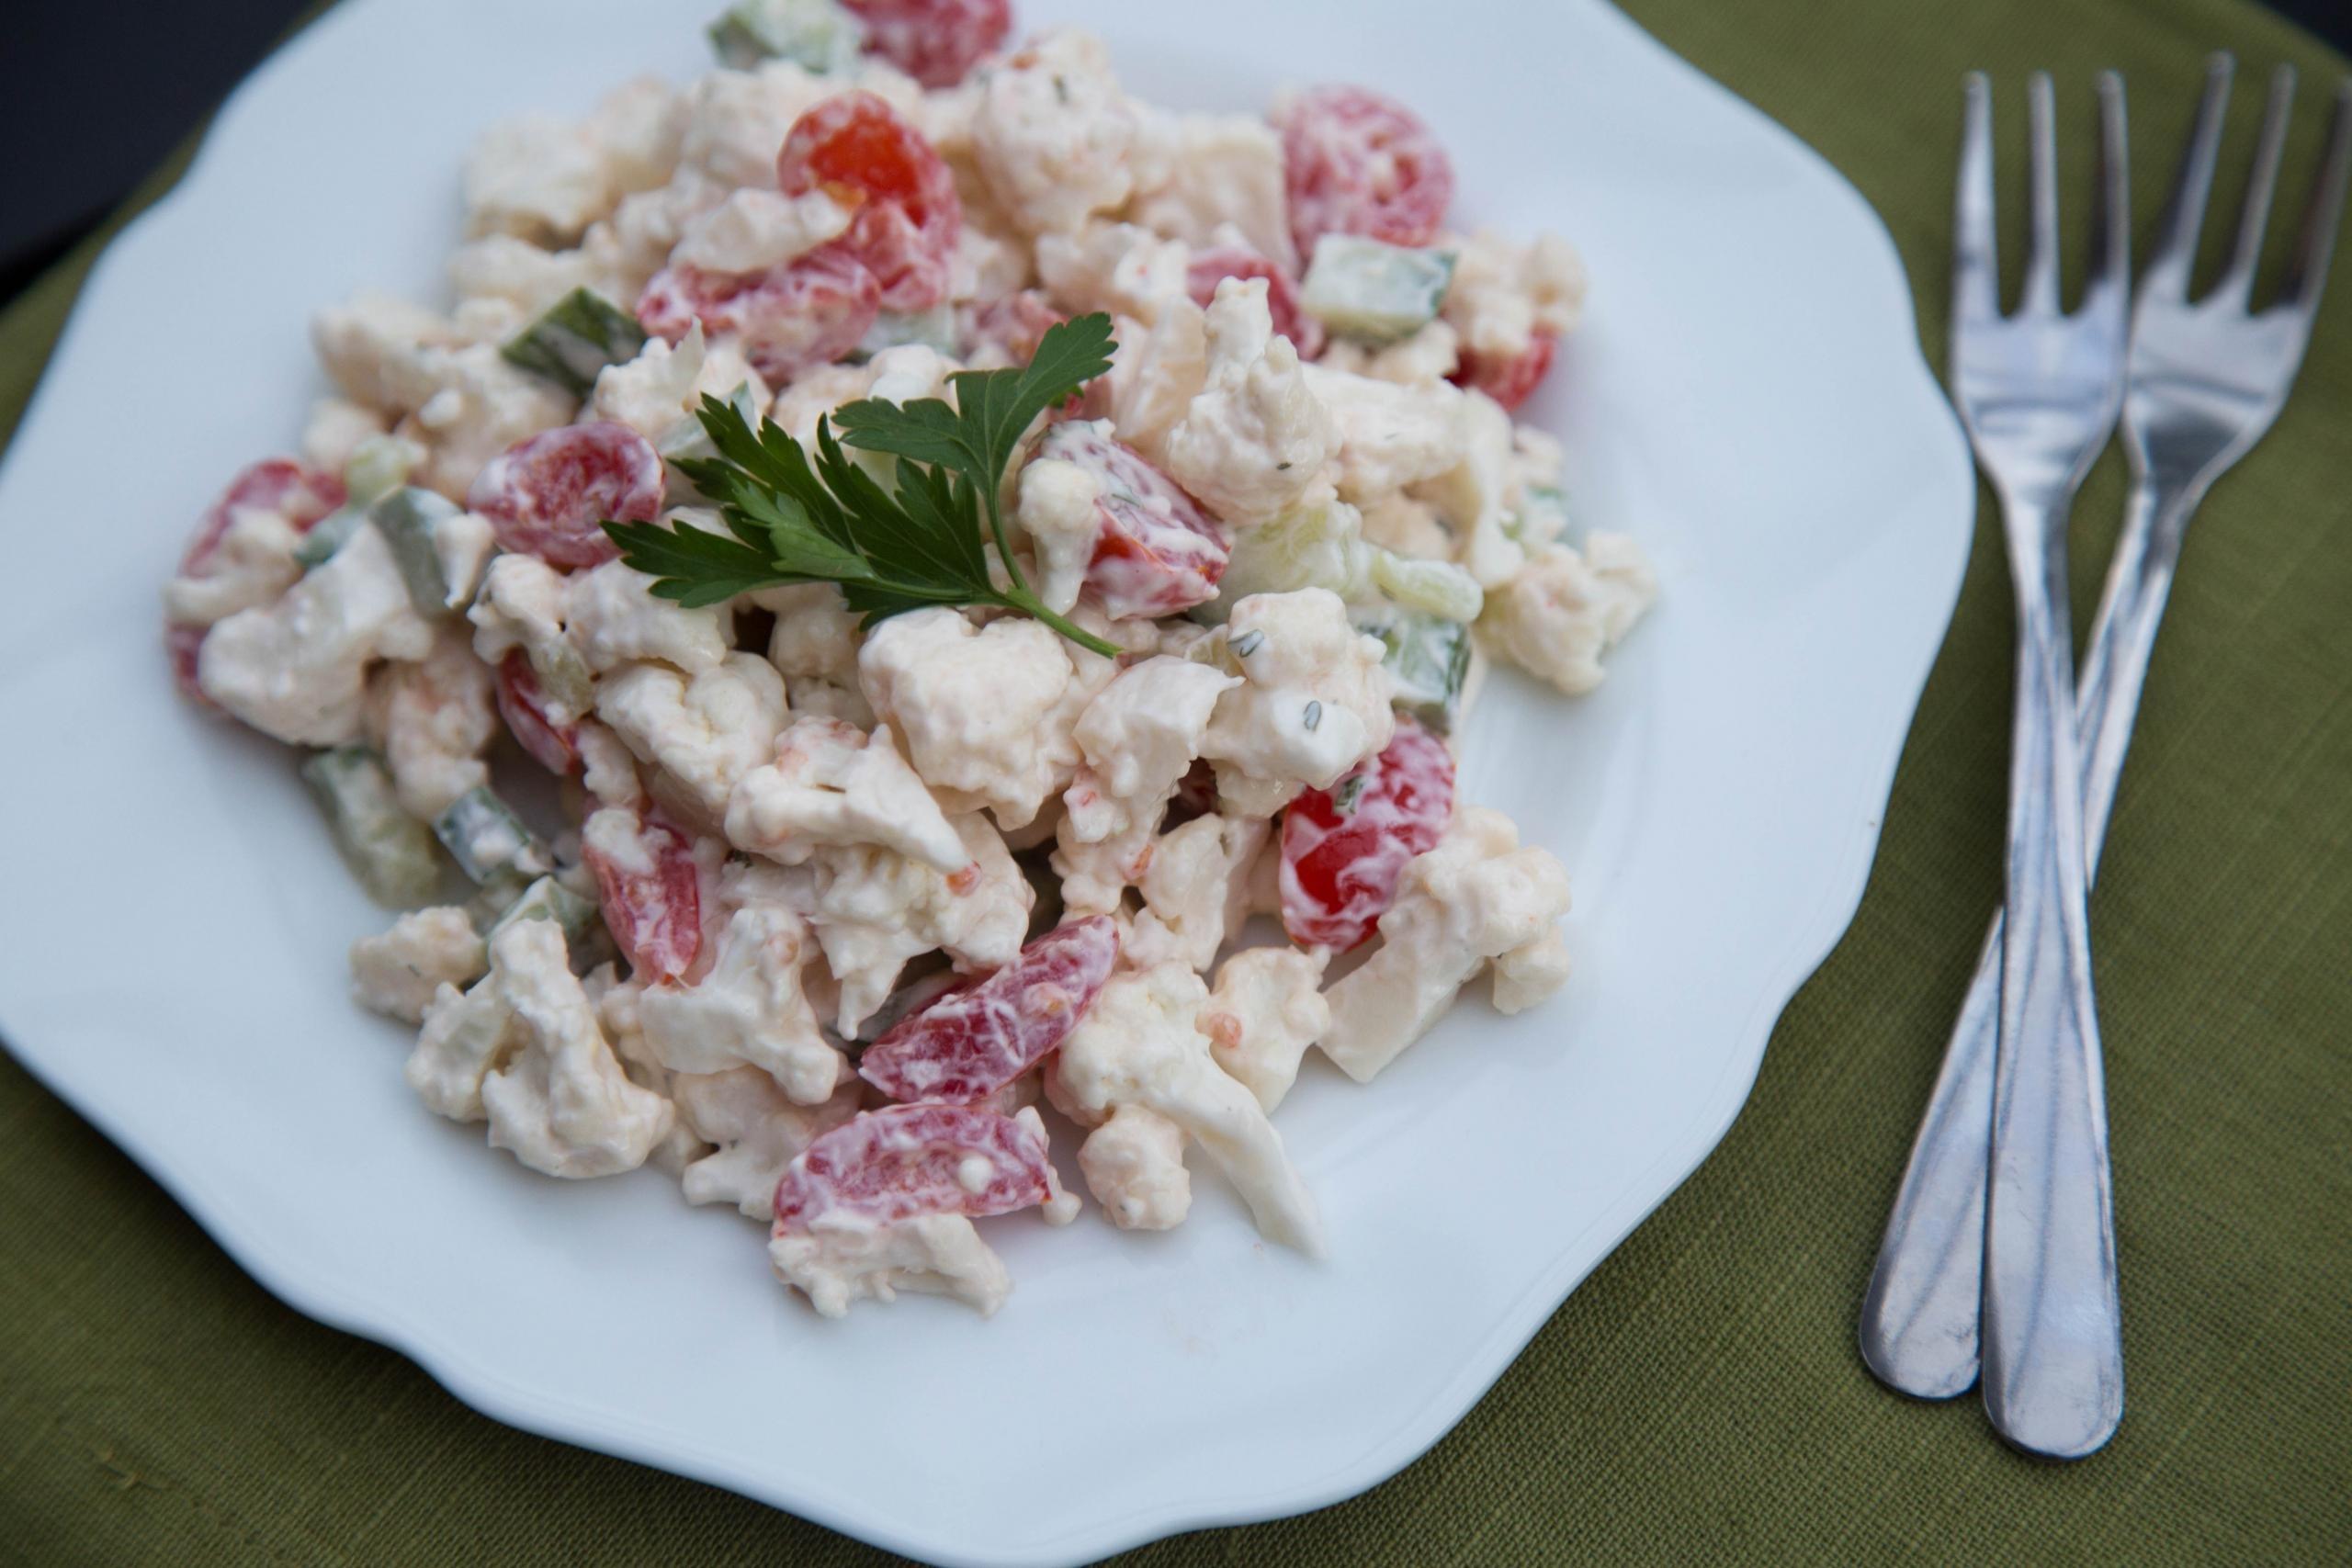 Fresh Cauliflower Salad on a plate